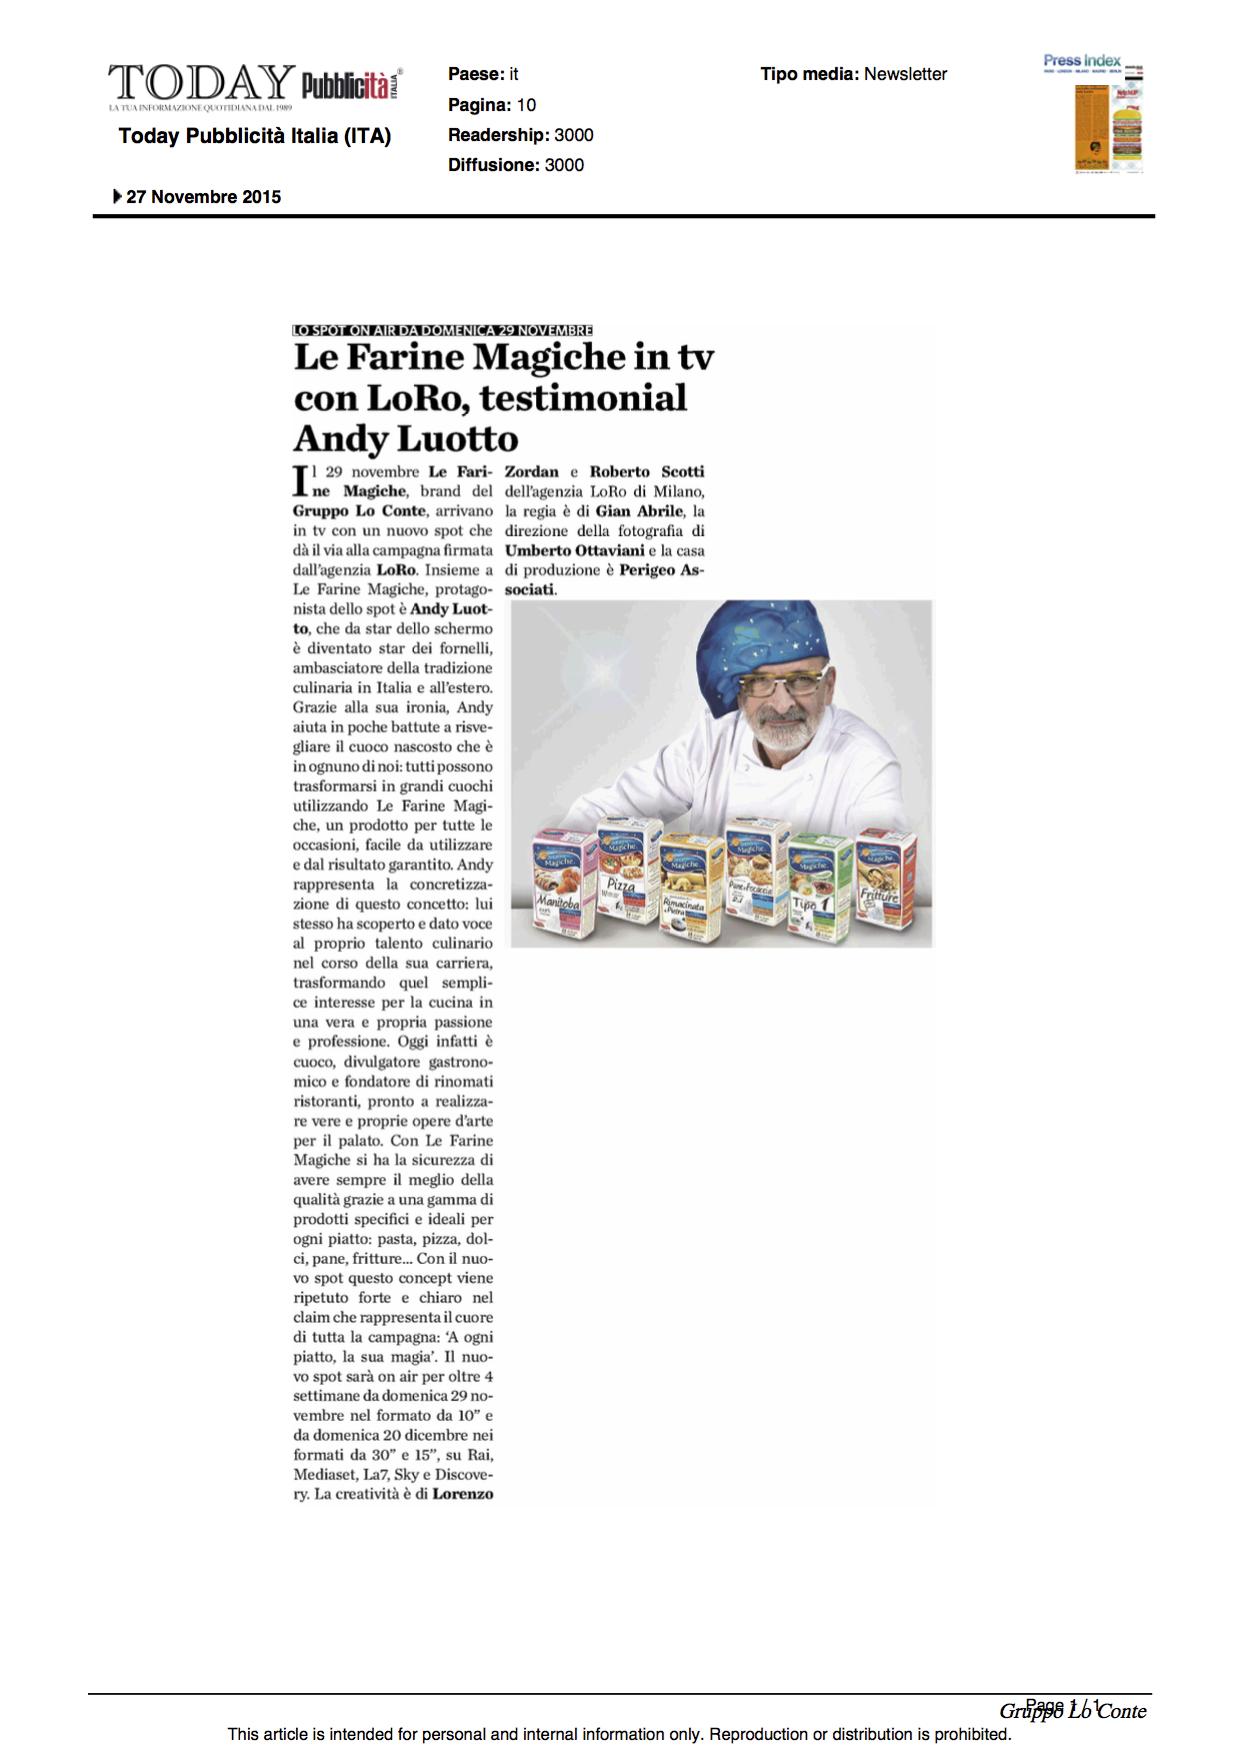 27.11.2015_PUBBLICITA' ITALIA TODAY